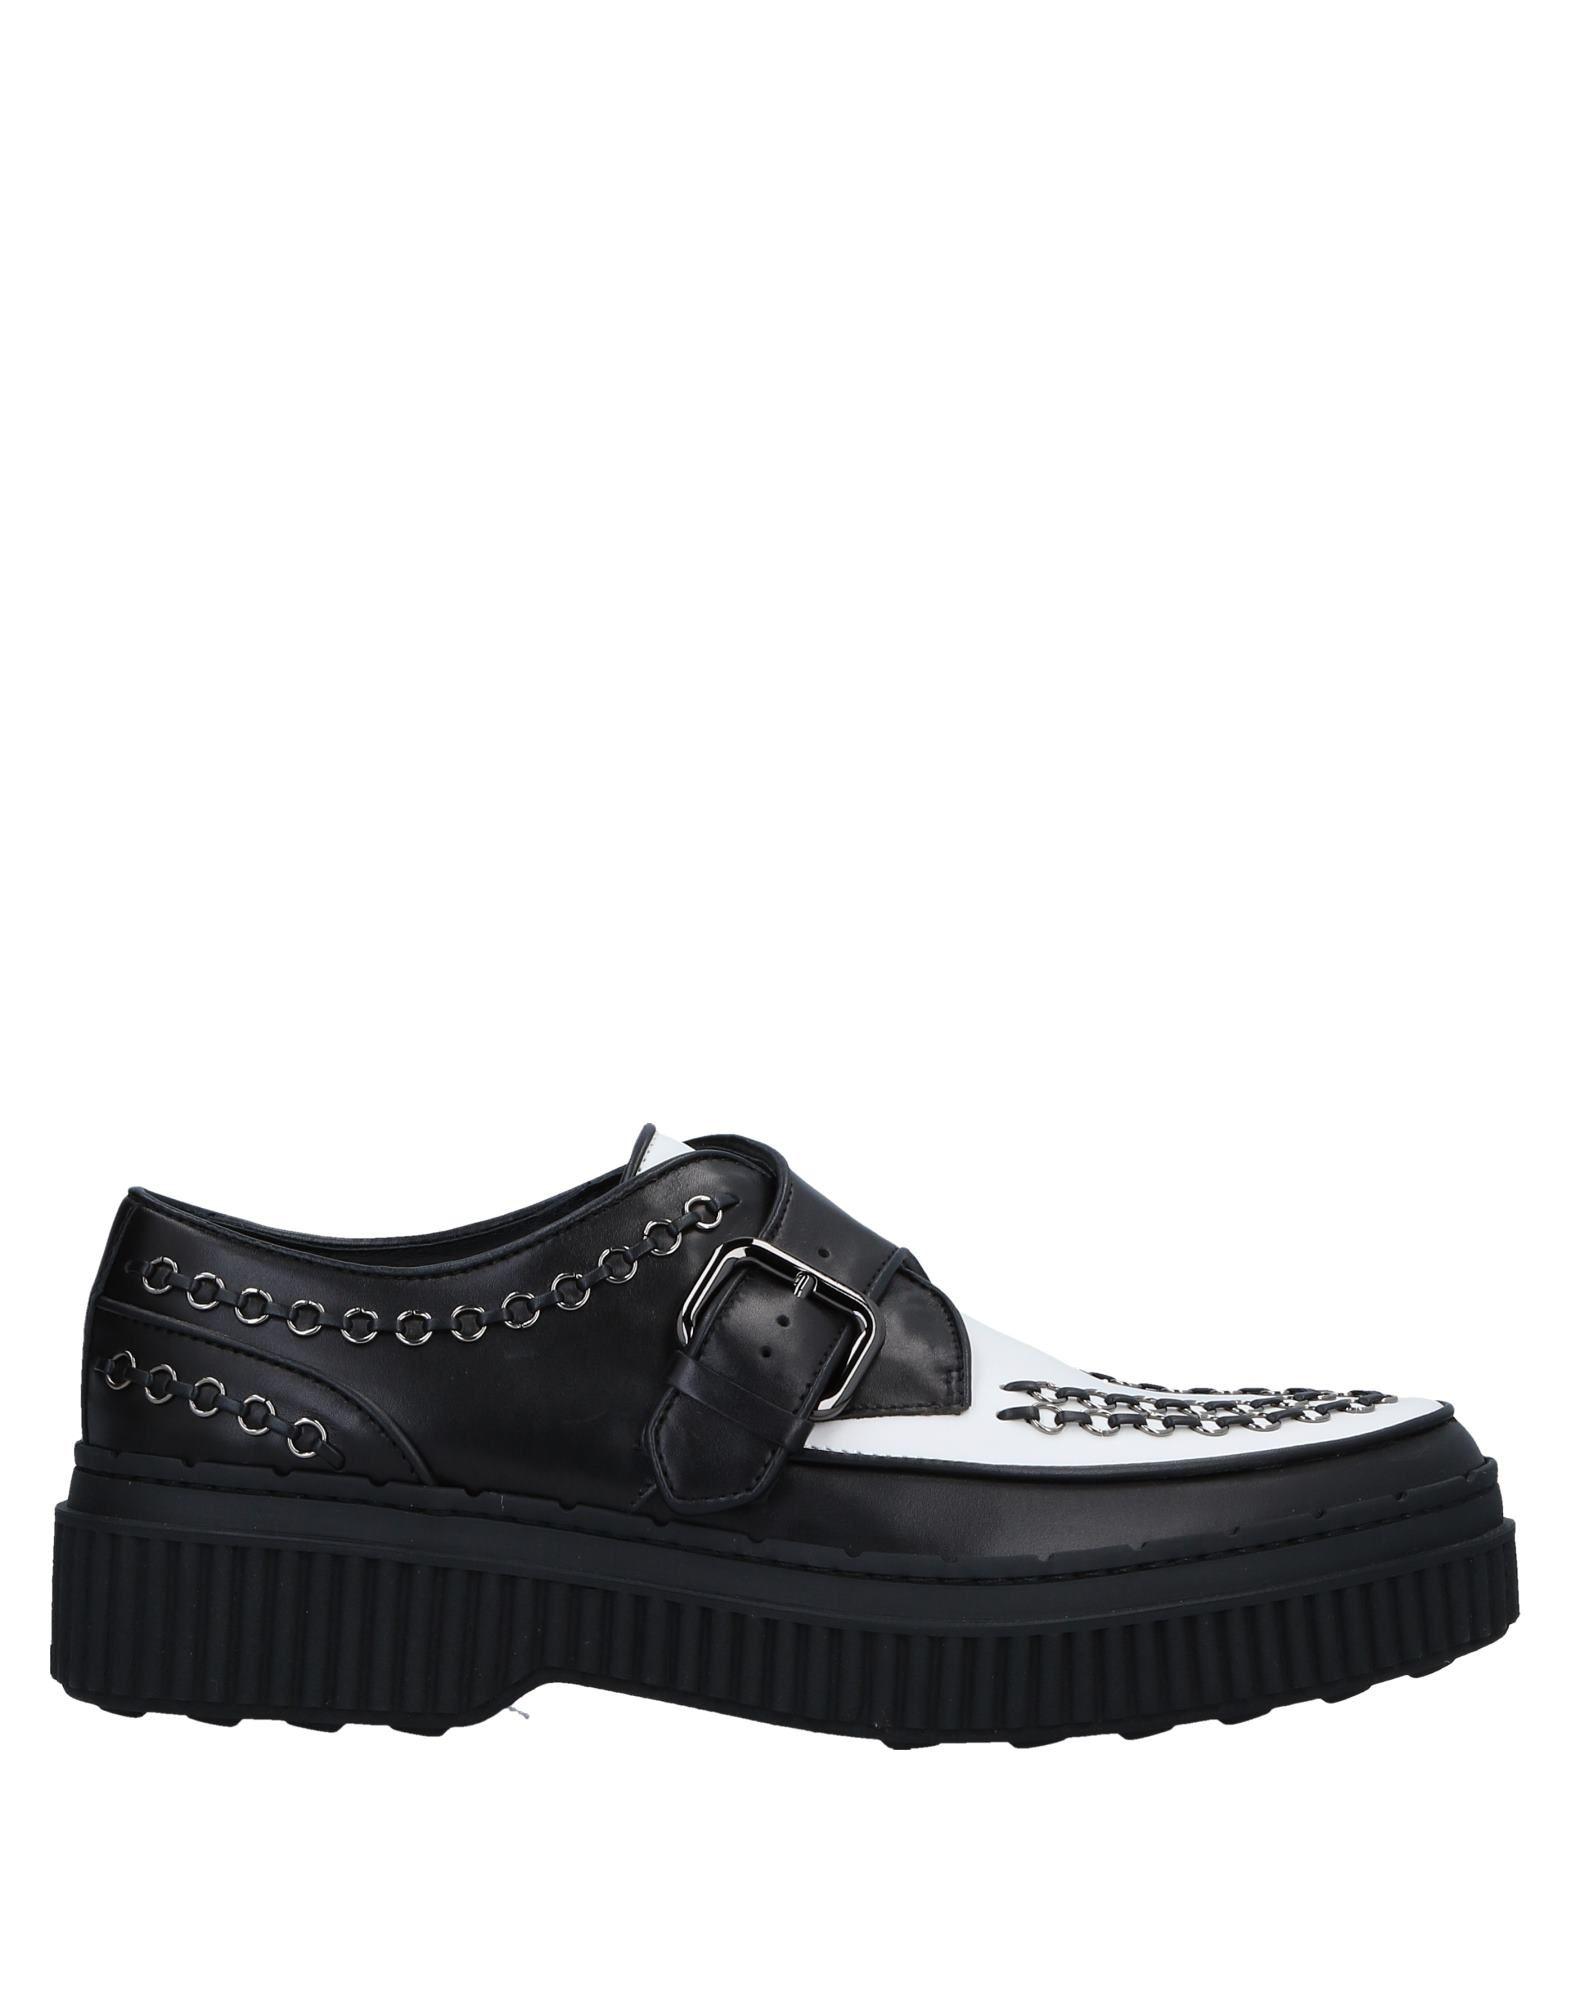 Haltbare Mode billige Schuhe Tod's Mokassins Damen  11542443PV Heiße Schuhe